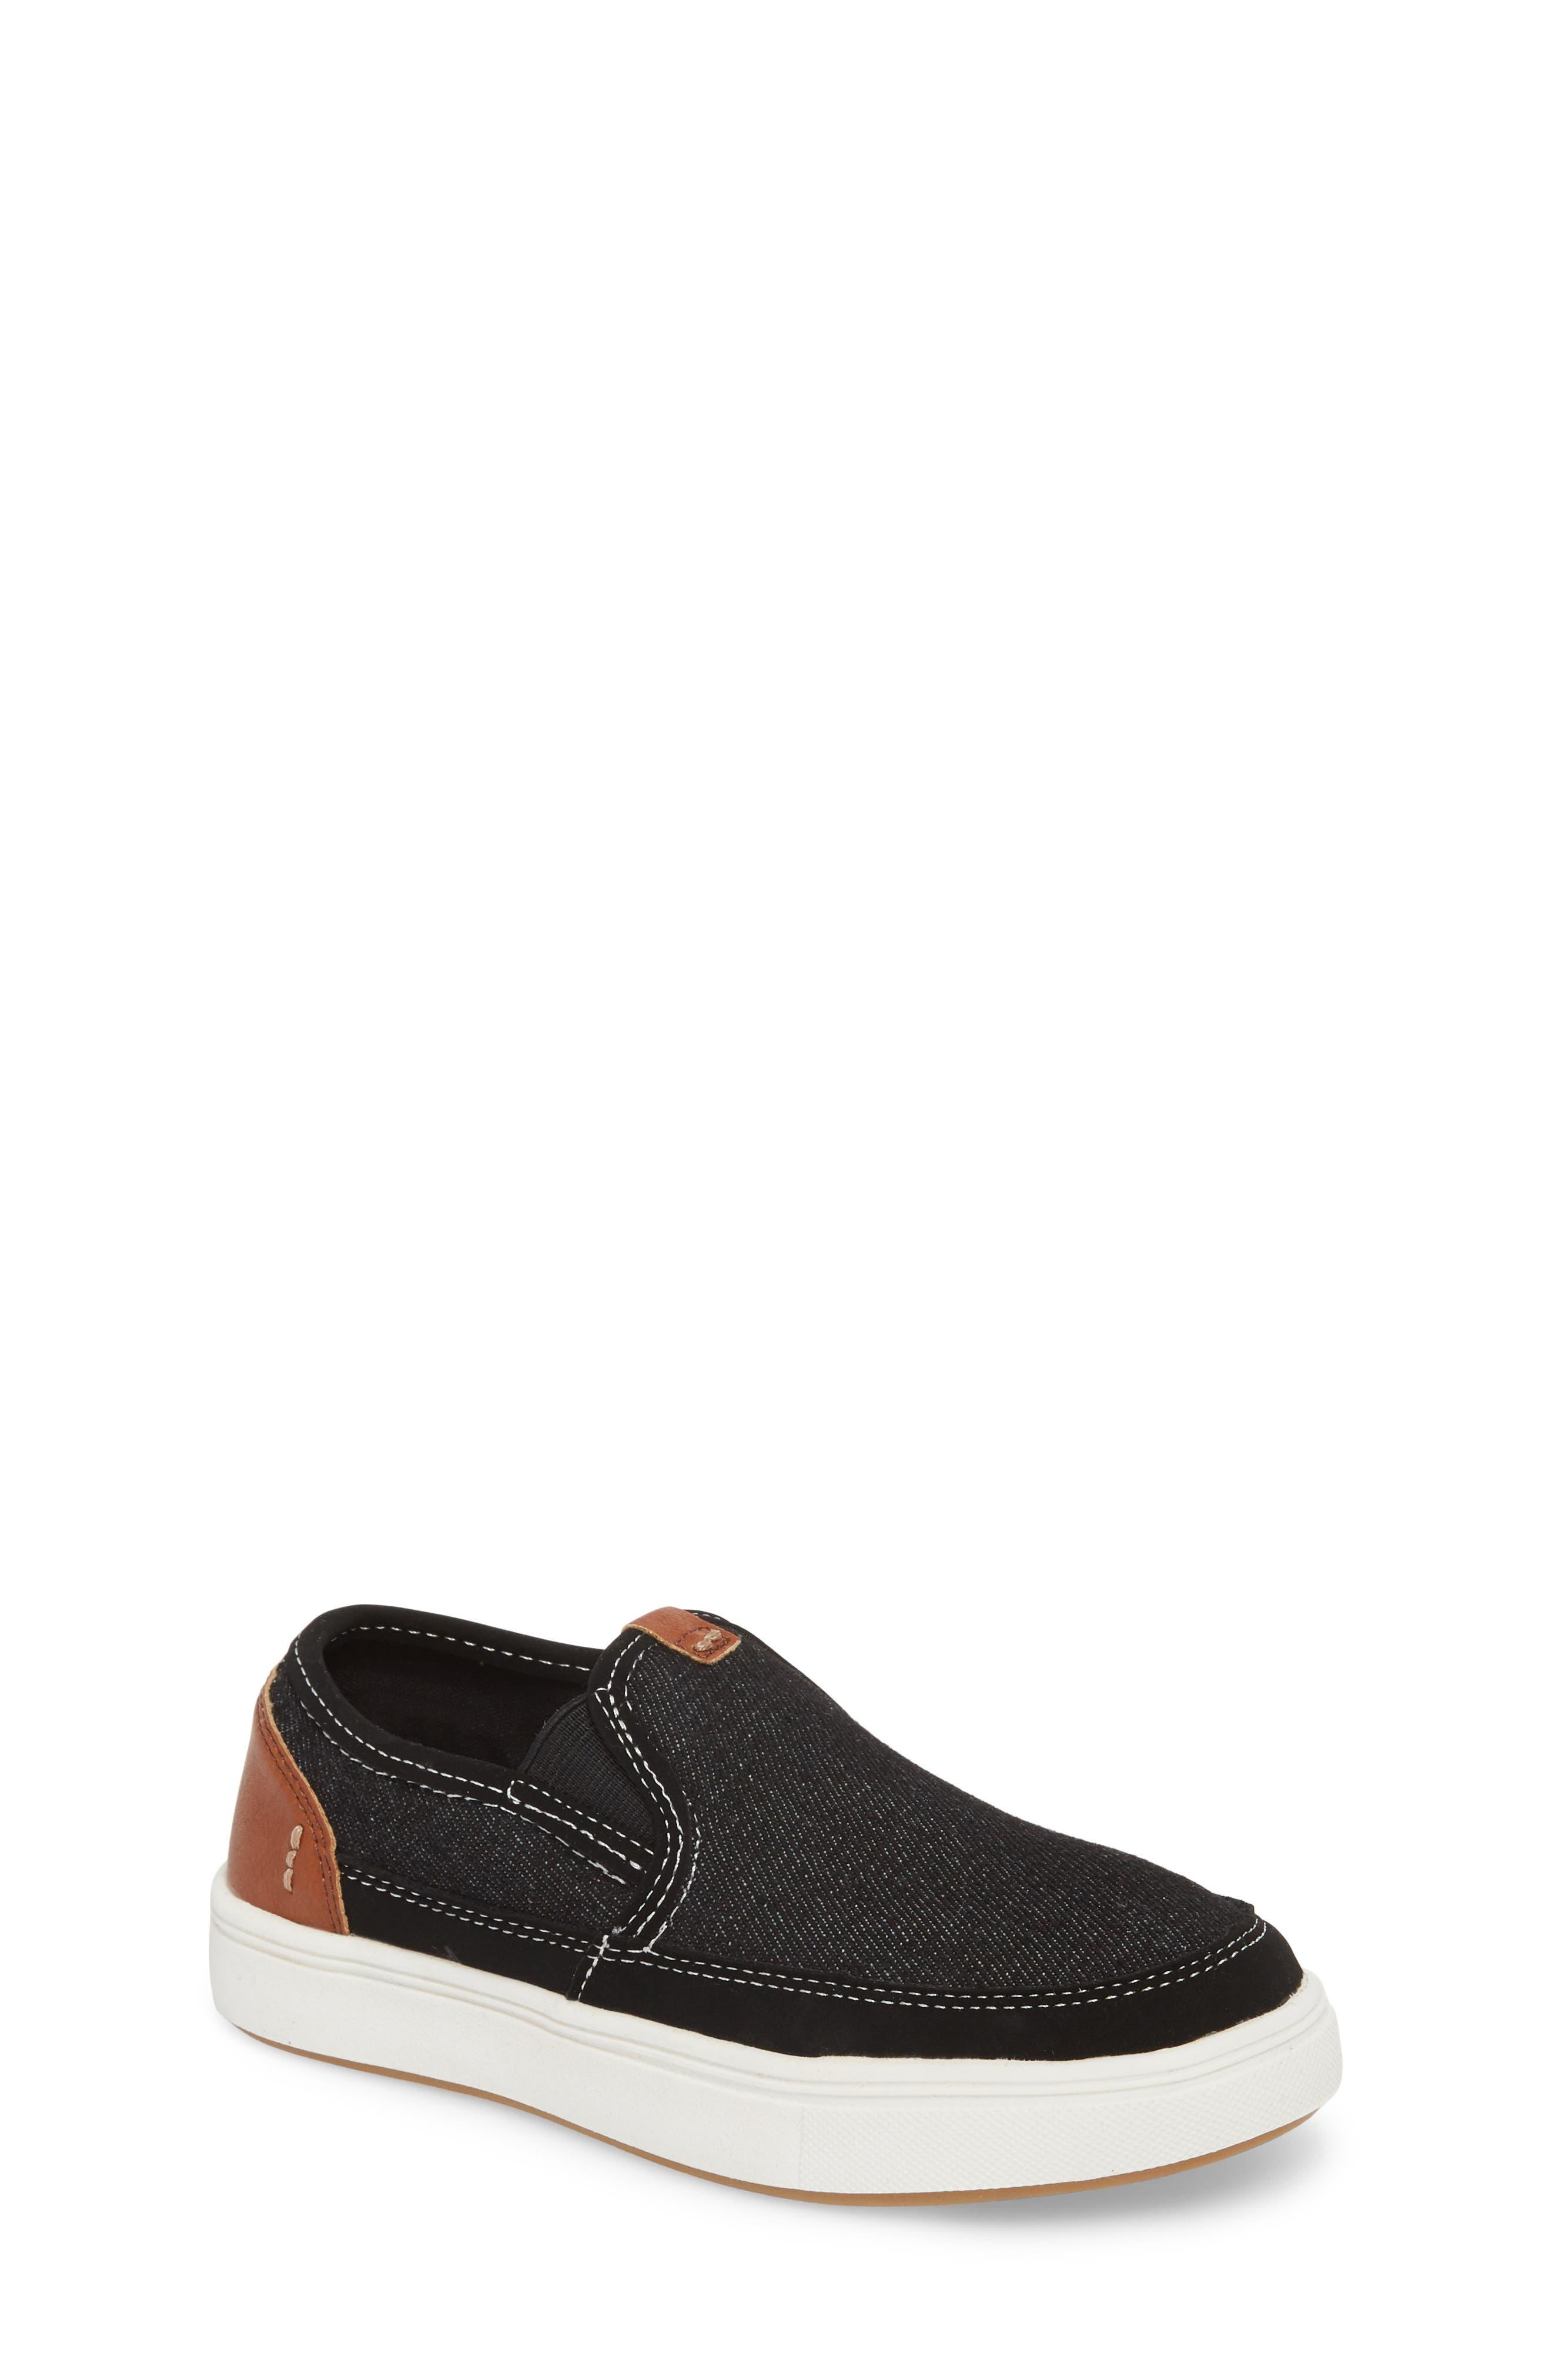 Bfoleeo Slip-On Sneaker,                             Main thumbnail 1, color,                             Black